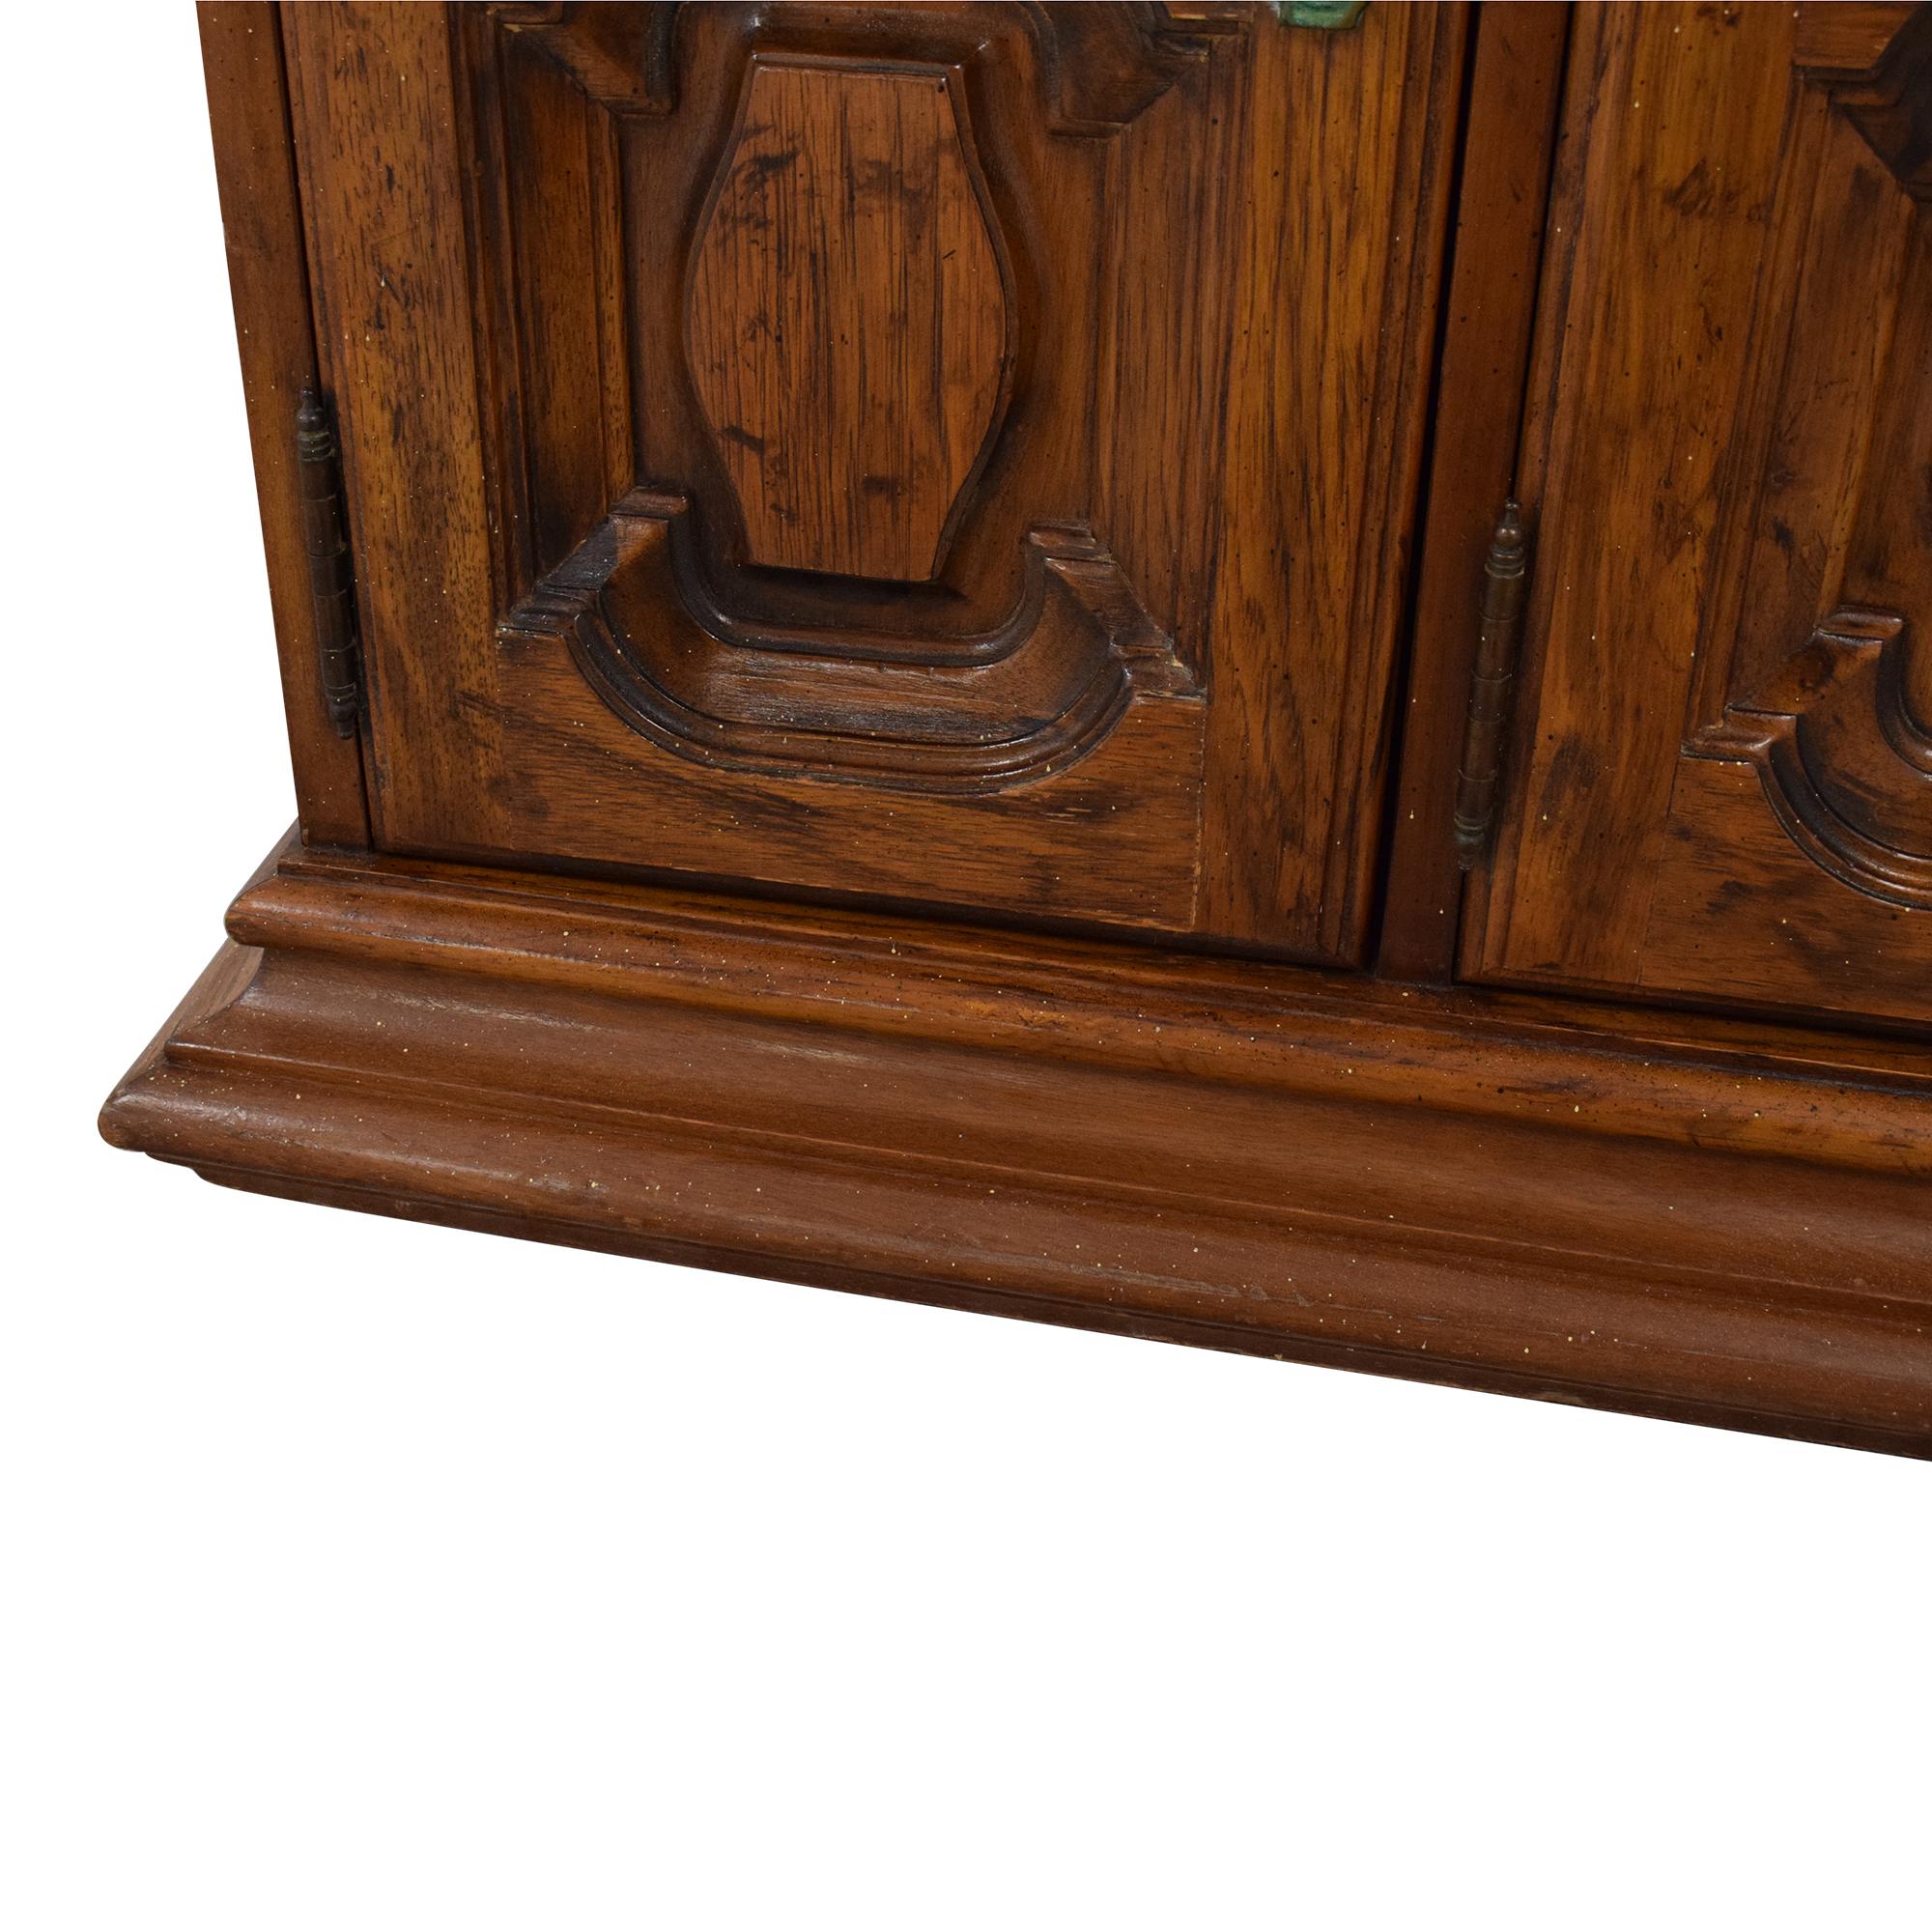 Heritage Heritage Extending Bar Cabinet for sale